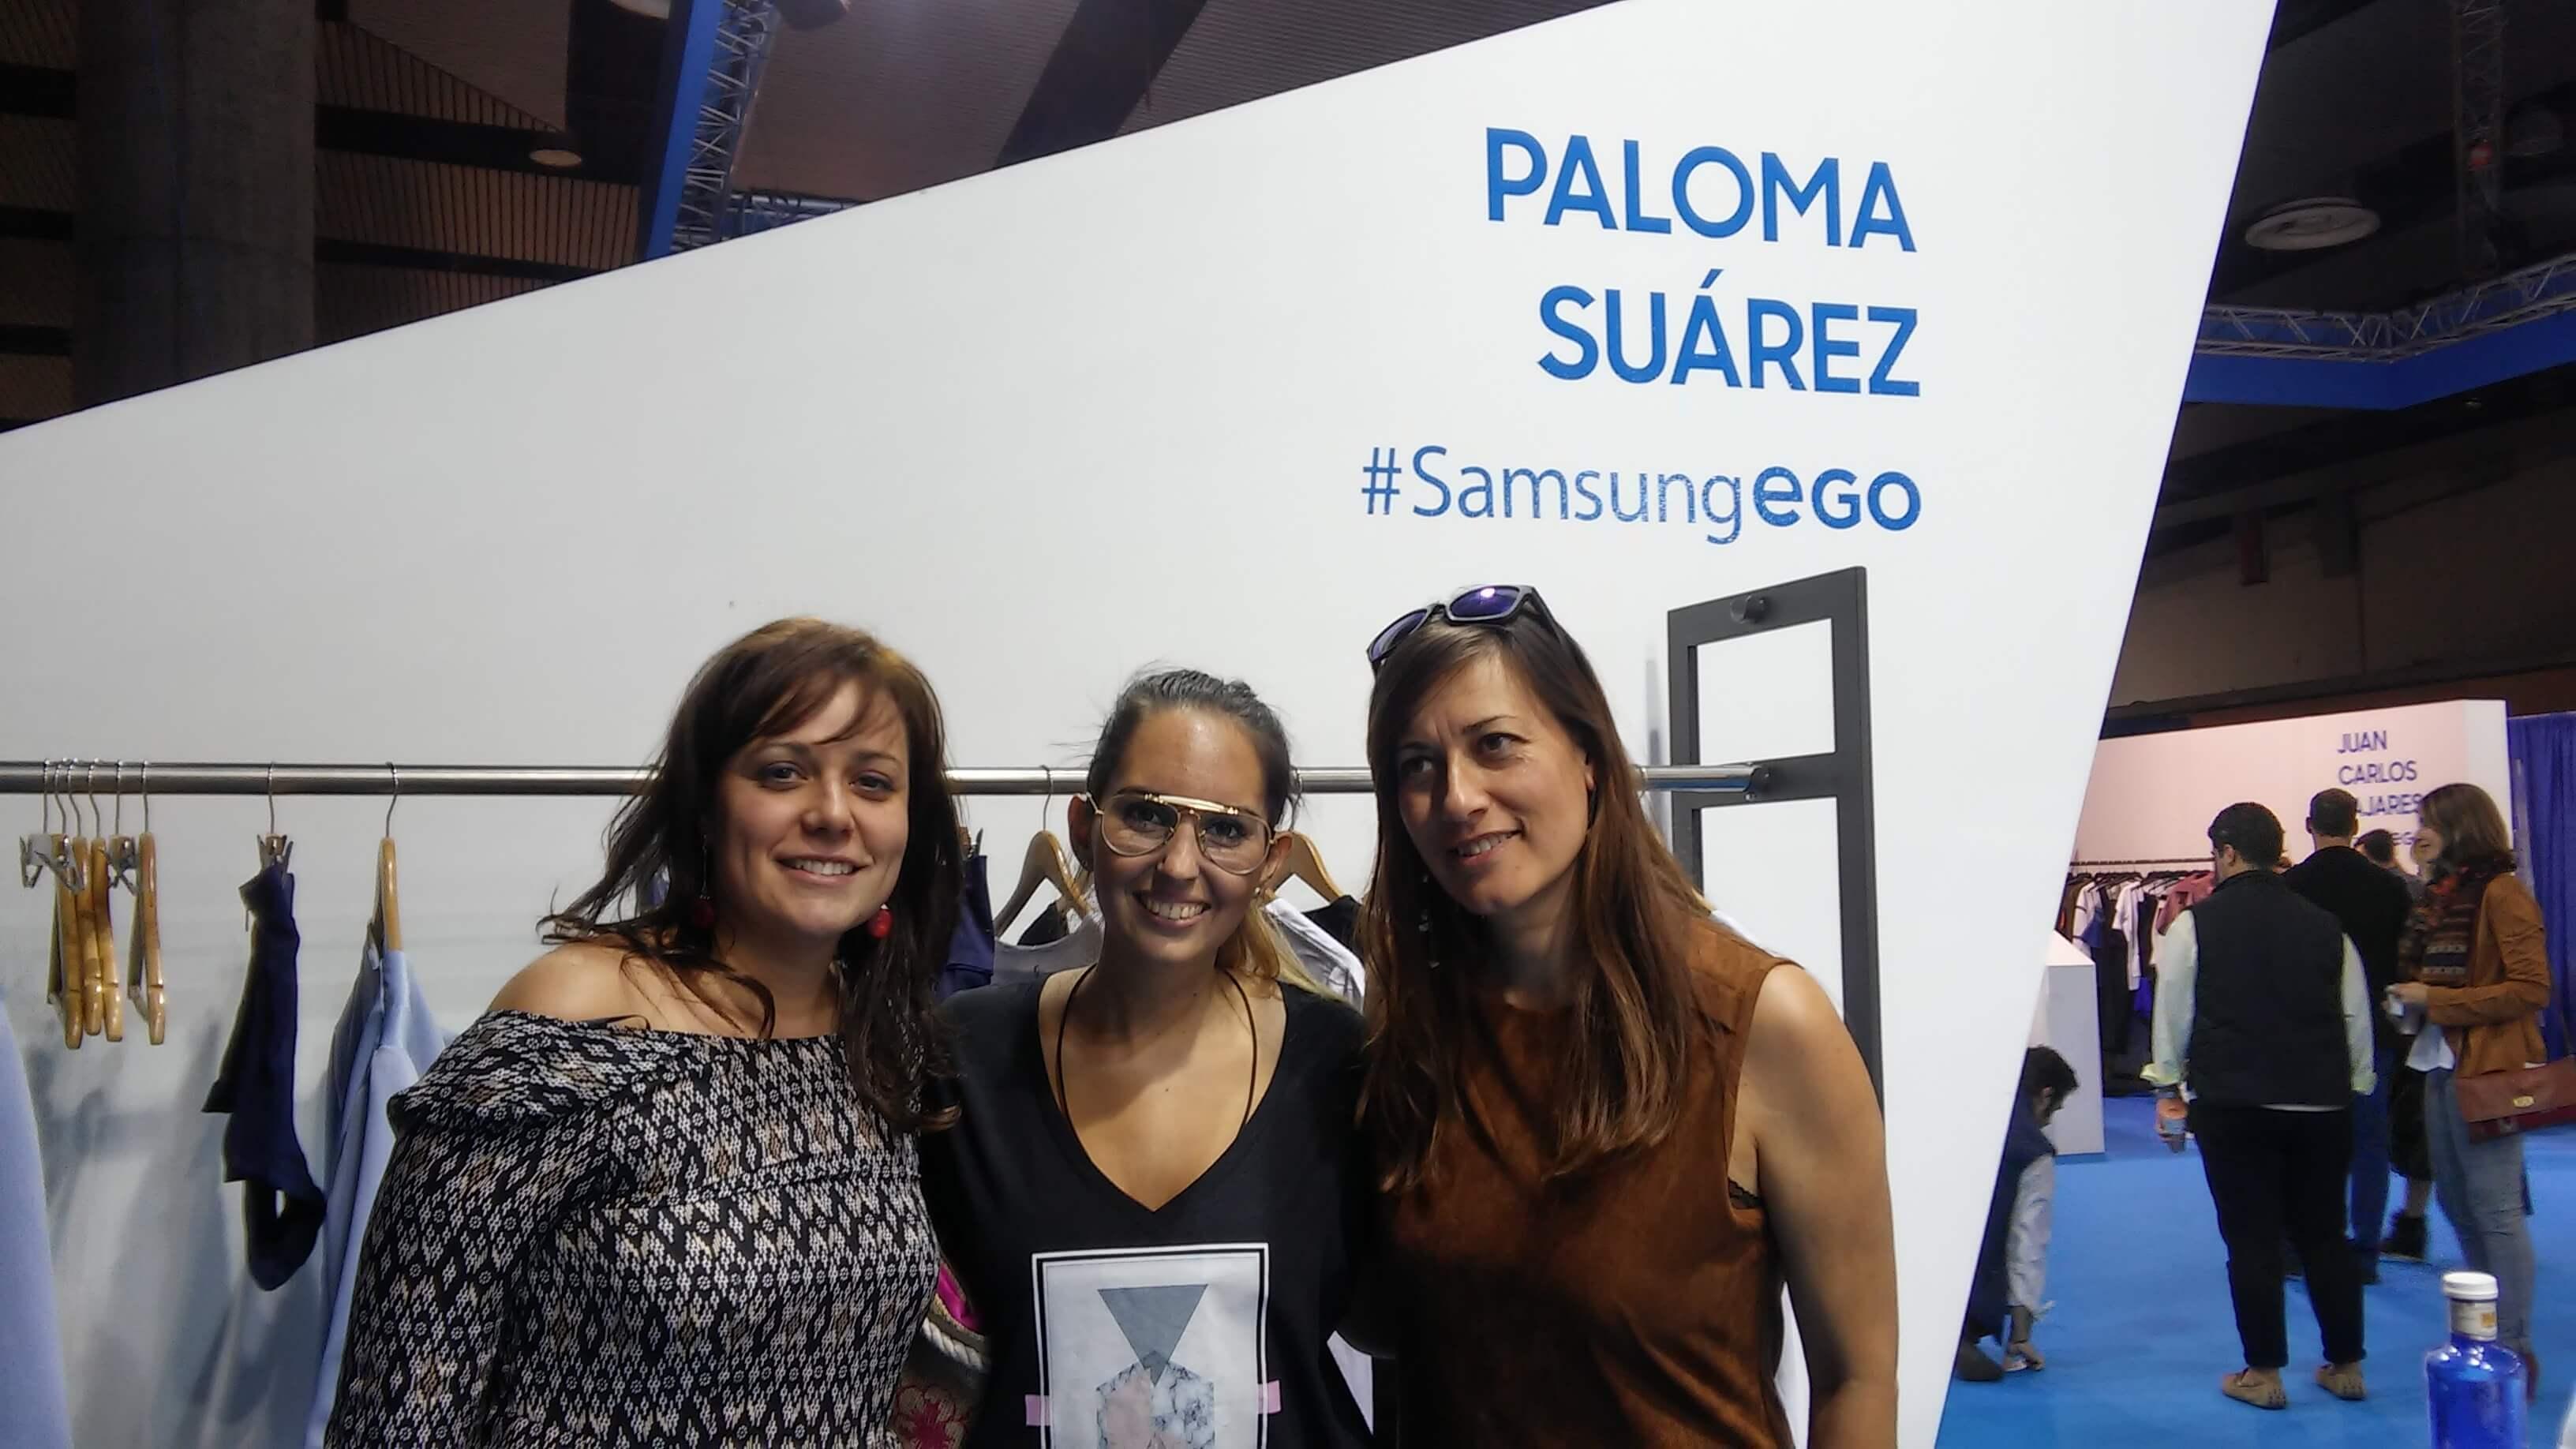 2015-09-19 PALOMA SUAREZ